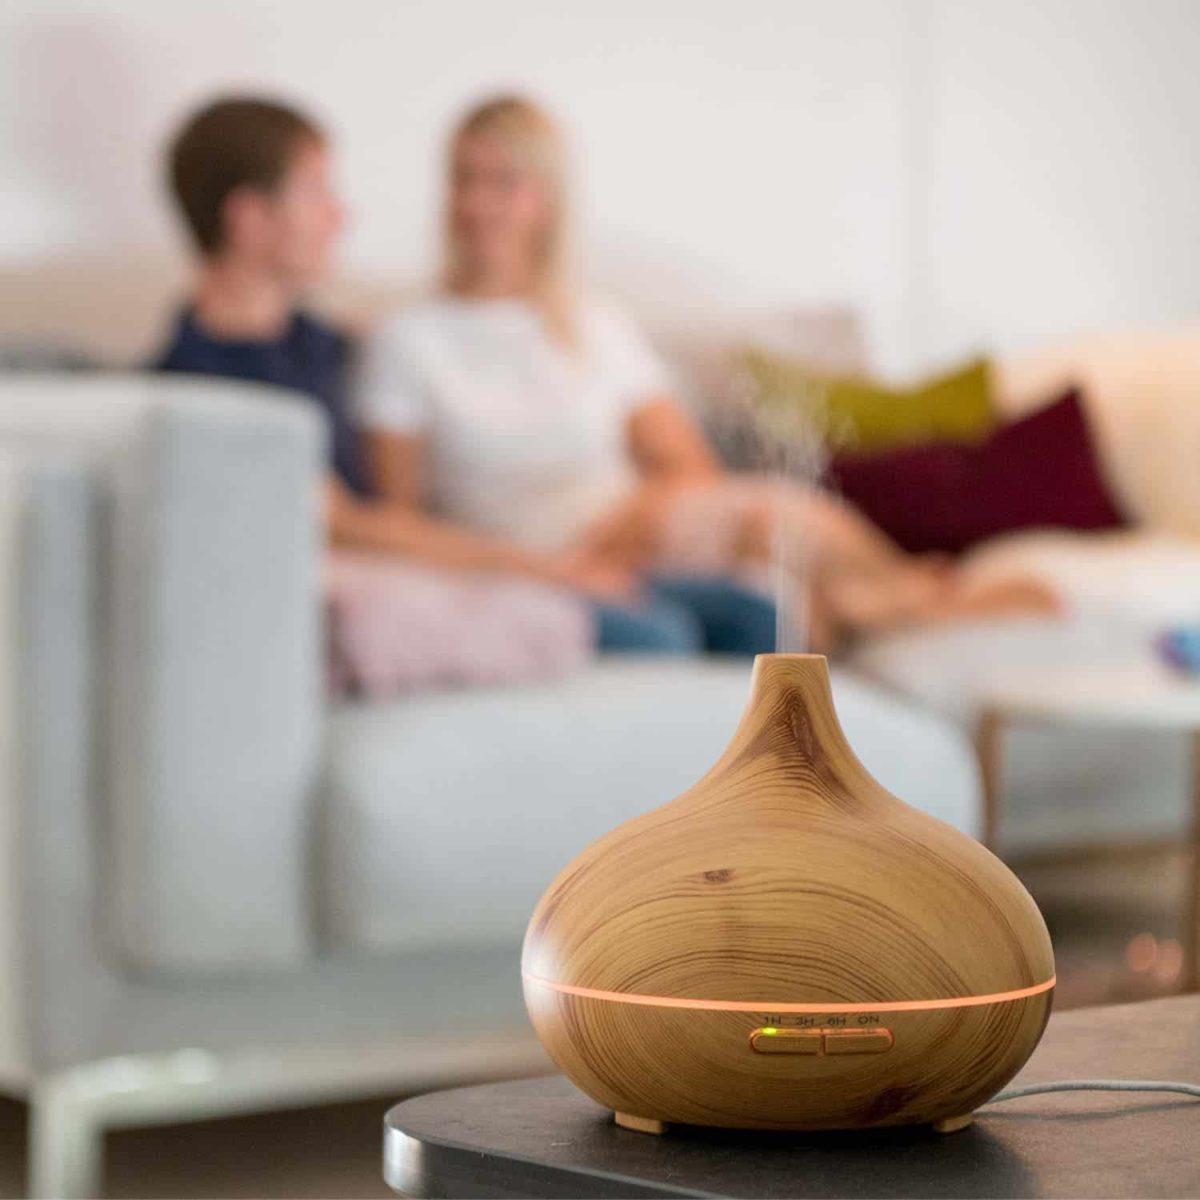 Casida Duftmischung Ruhe & Entspannung - 5 ml 17394517 PZN Apotheke Entspannung Aromatherapie Aromapflege Aromaschmuck Diffuser3